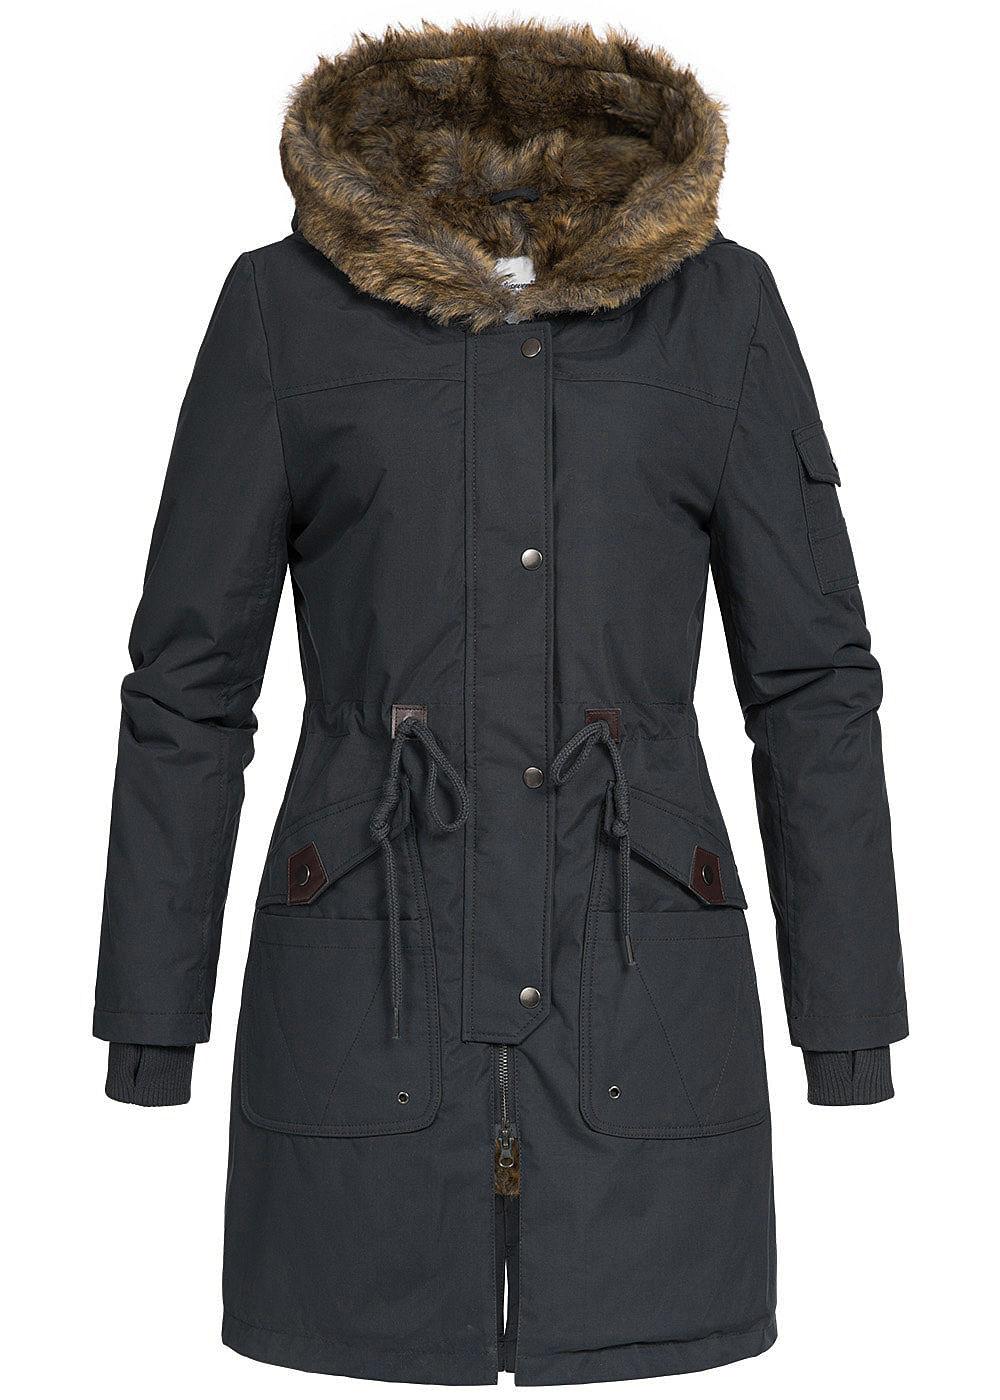 Seventyseven Damen Winter Mantel Jacke Kapuze Kunstfell 5 Taschen schwarz